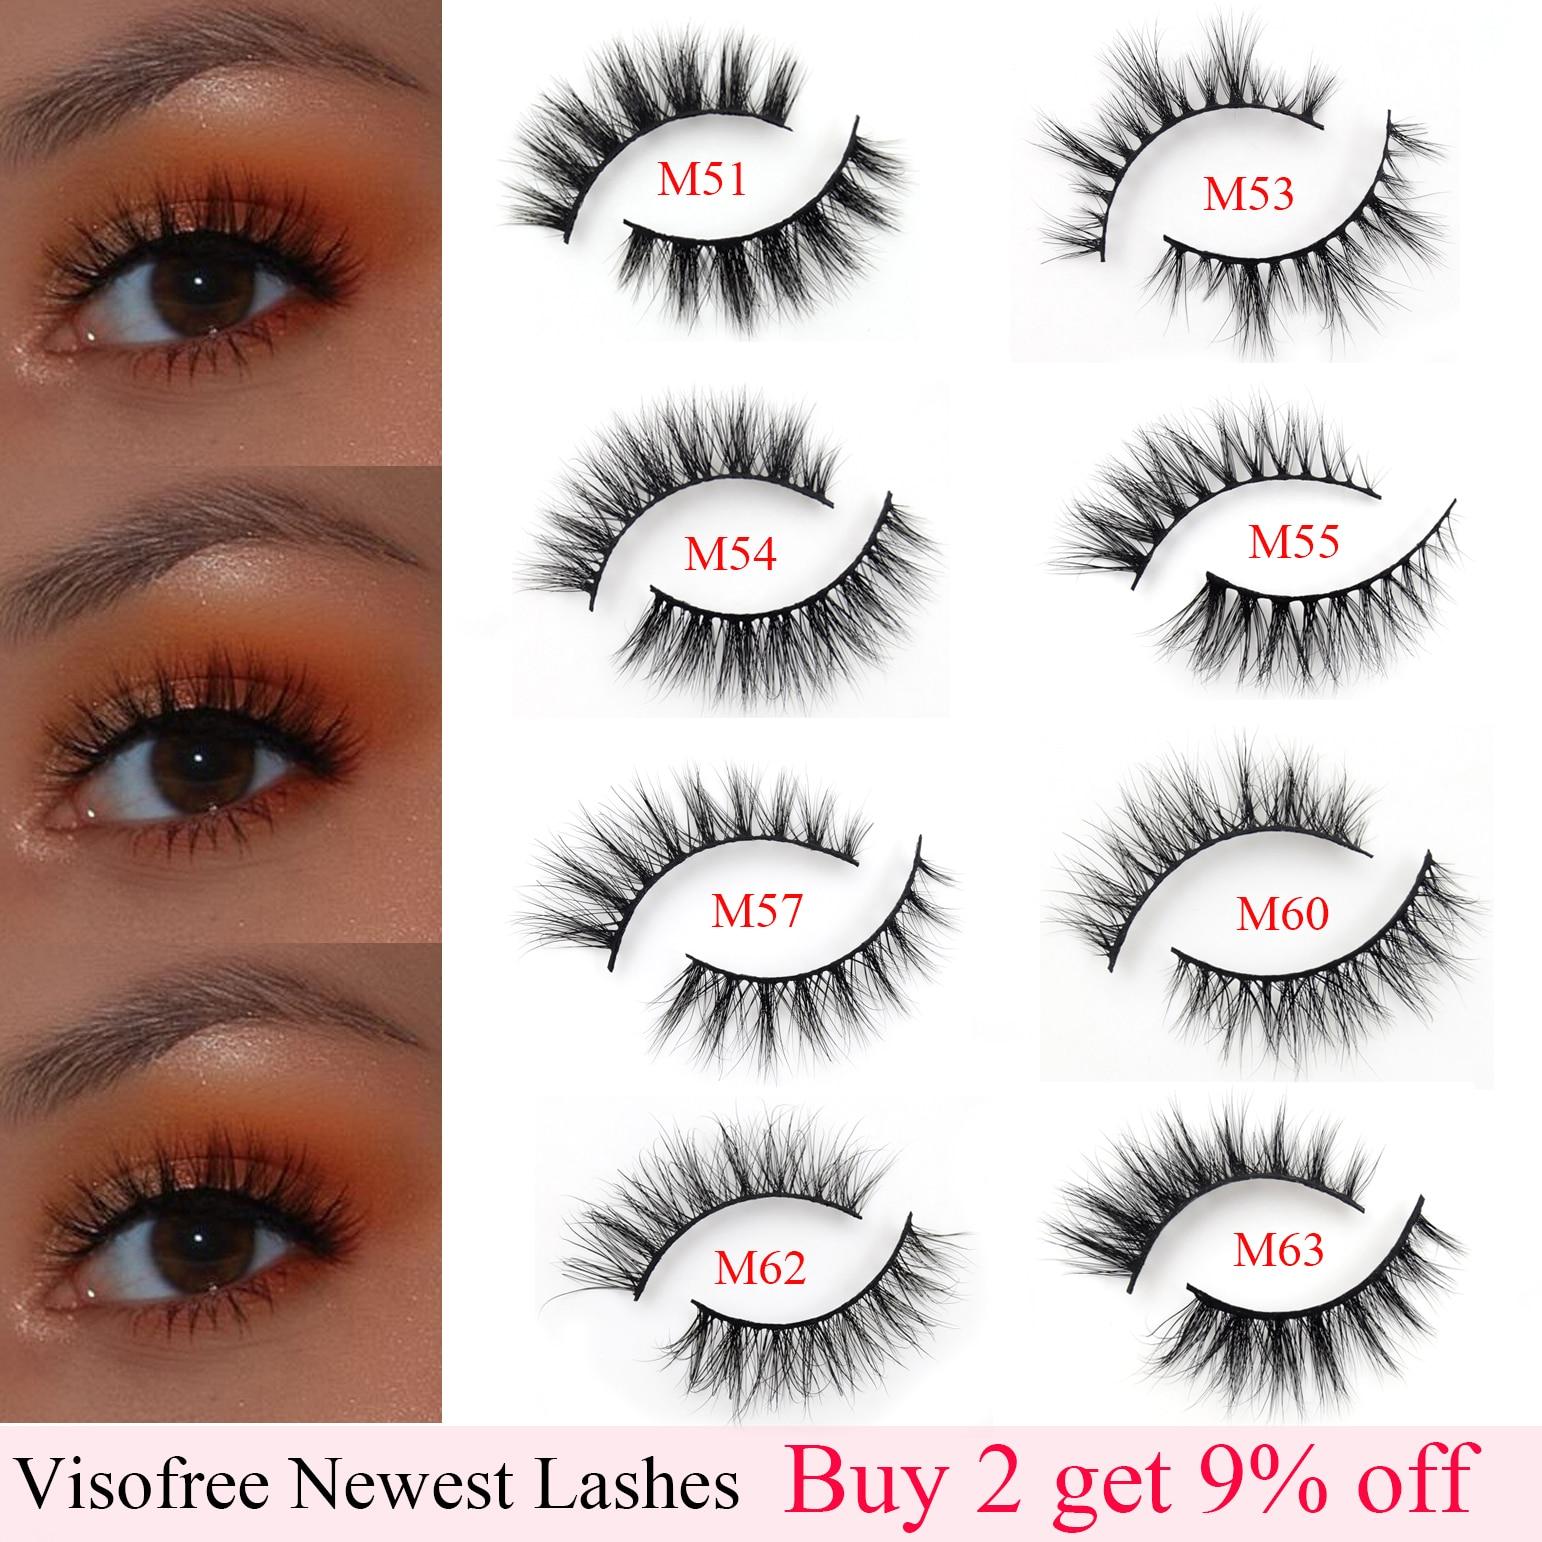 Visofree Eyelashes Natural False Fake Lashes Long Makeup 3D Mink Extension Eyelash for Beauty